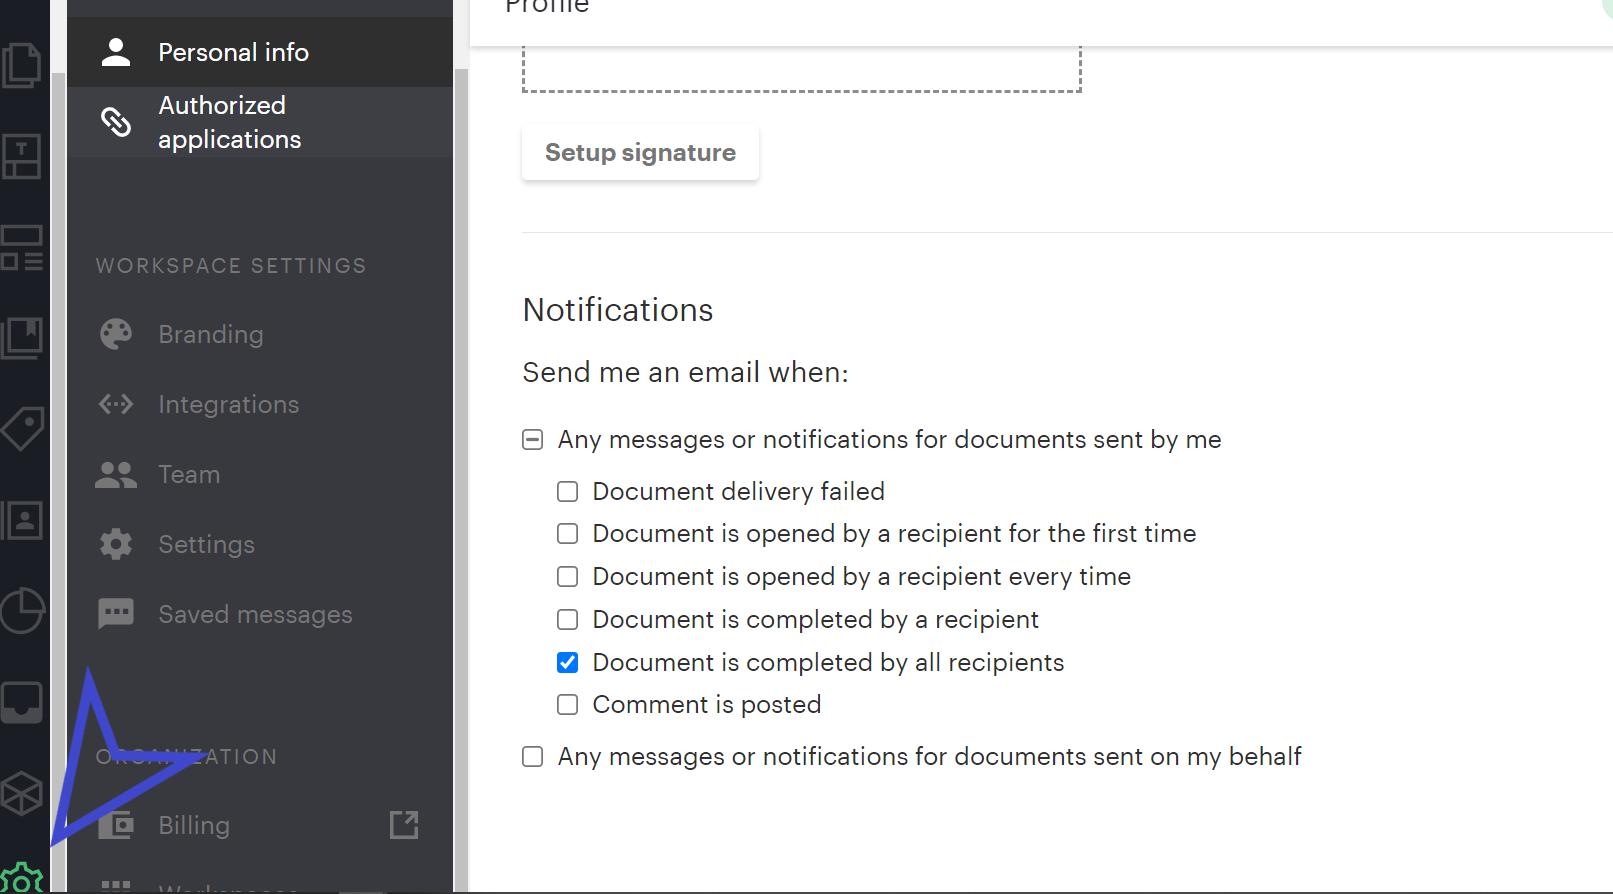 notification pandadoc settings